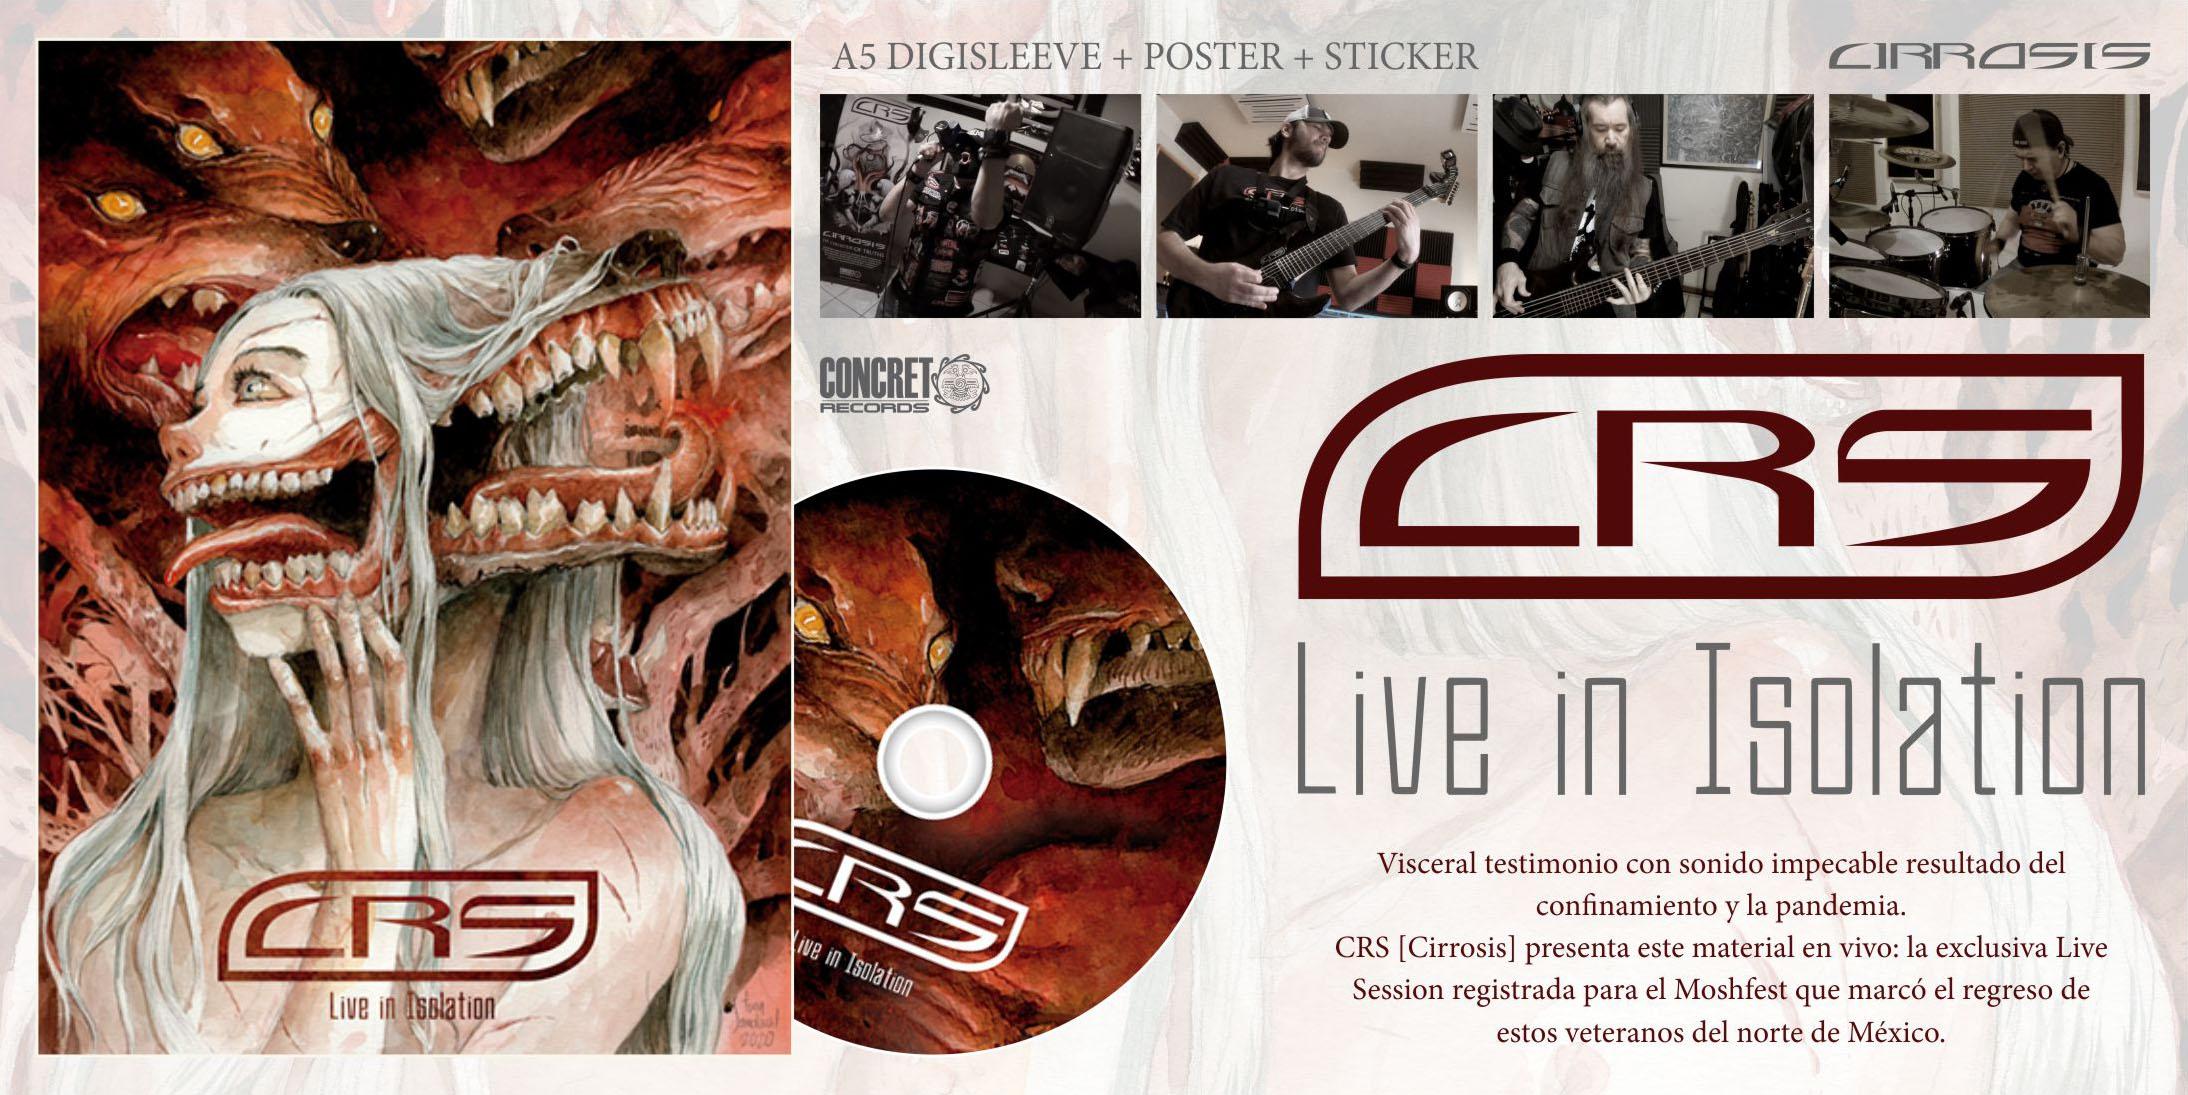 Slider CRS - Live in Isolation